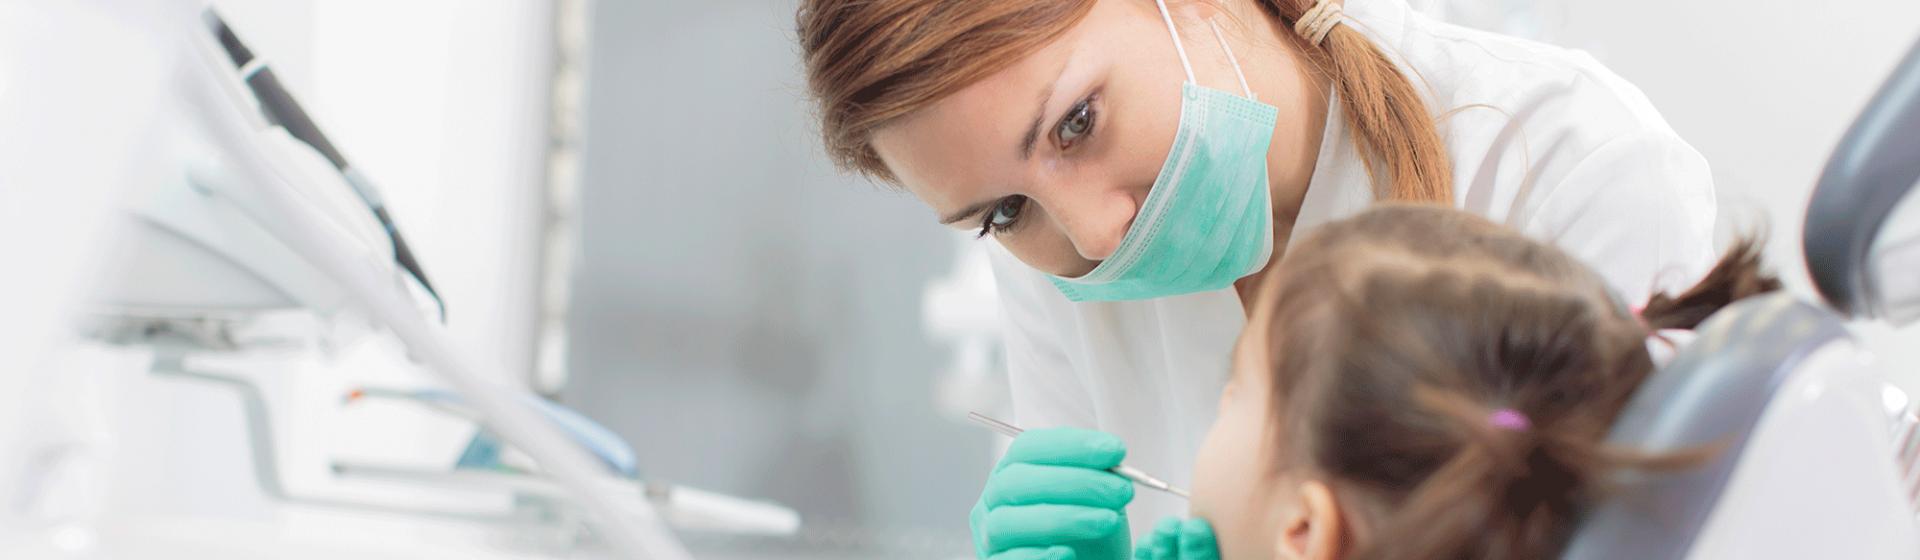 Método Dentario